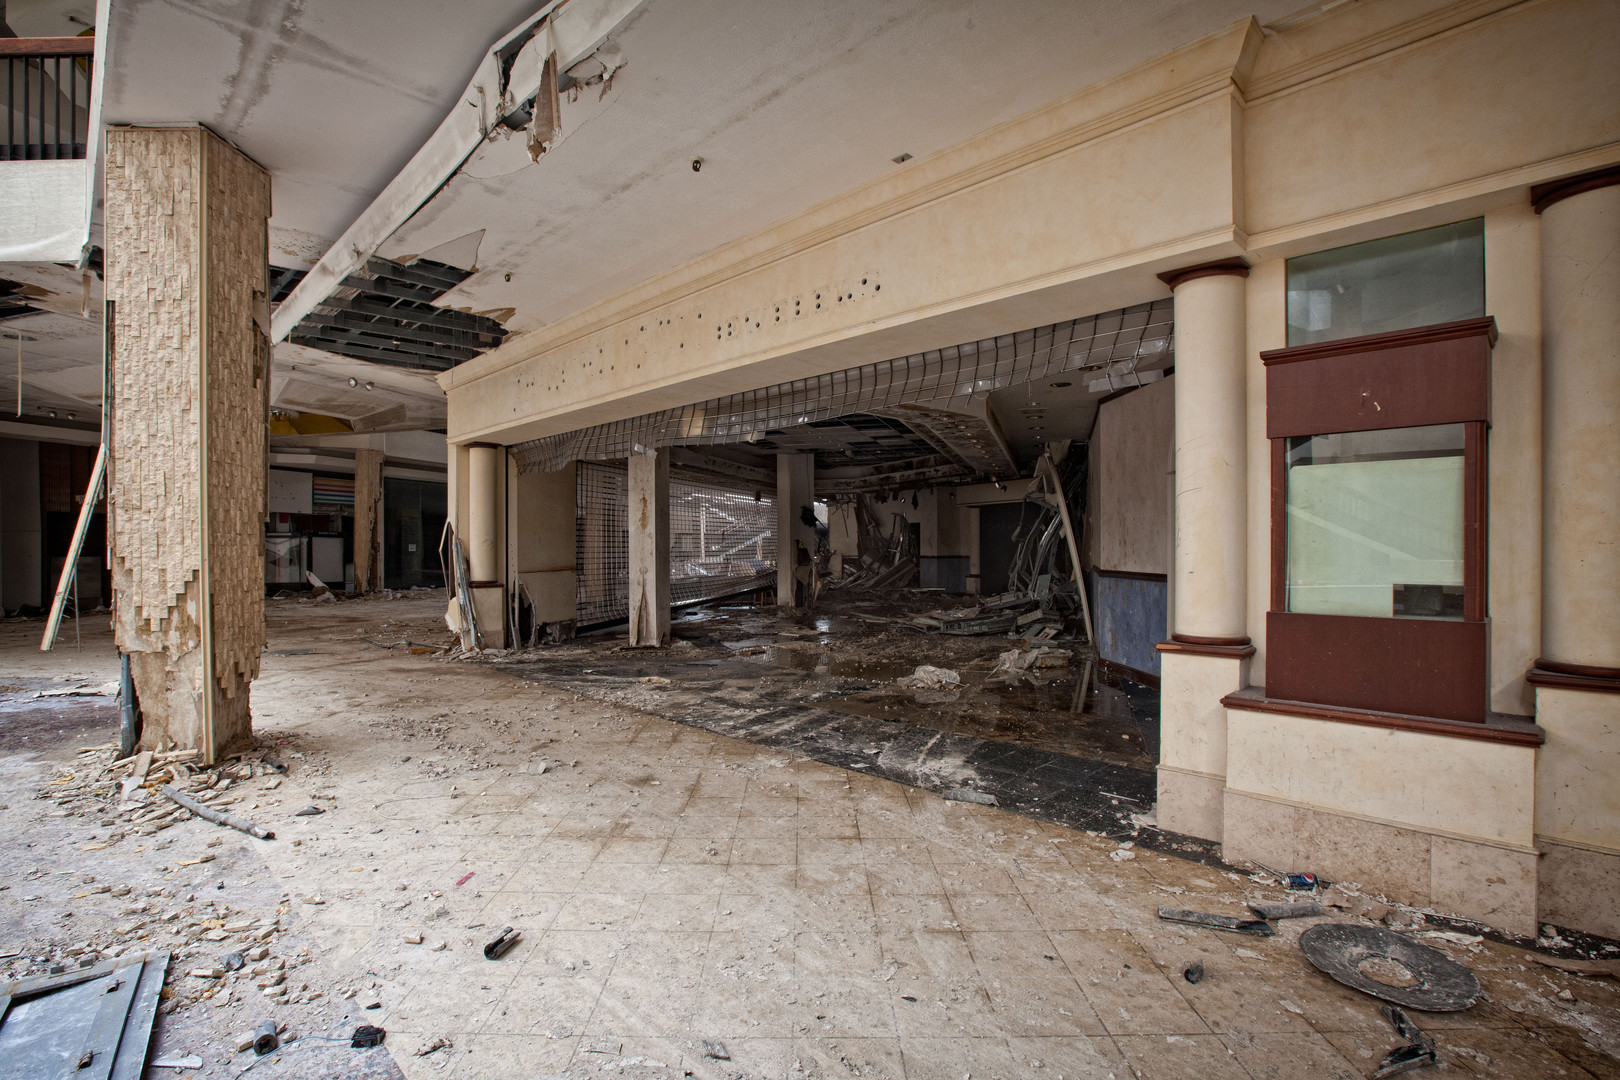 Randall Park Mall | Smashed Storefront